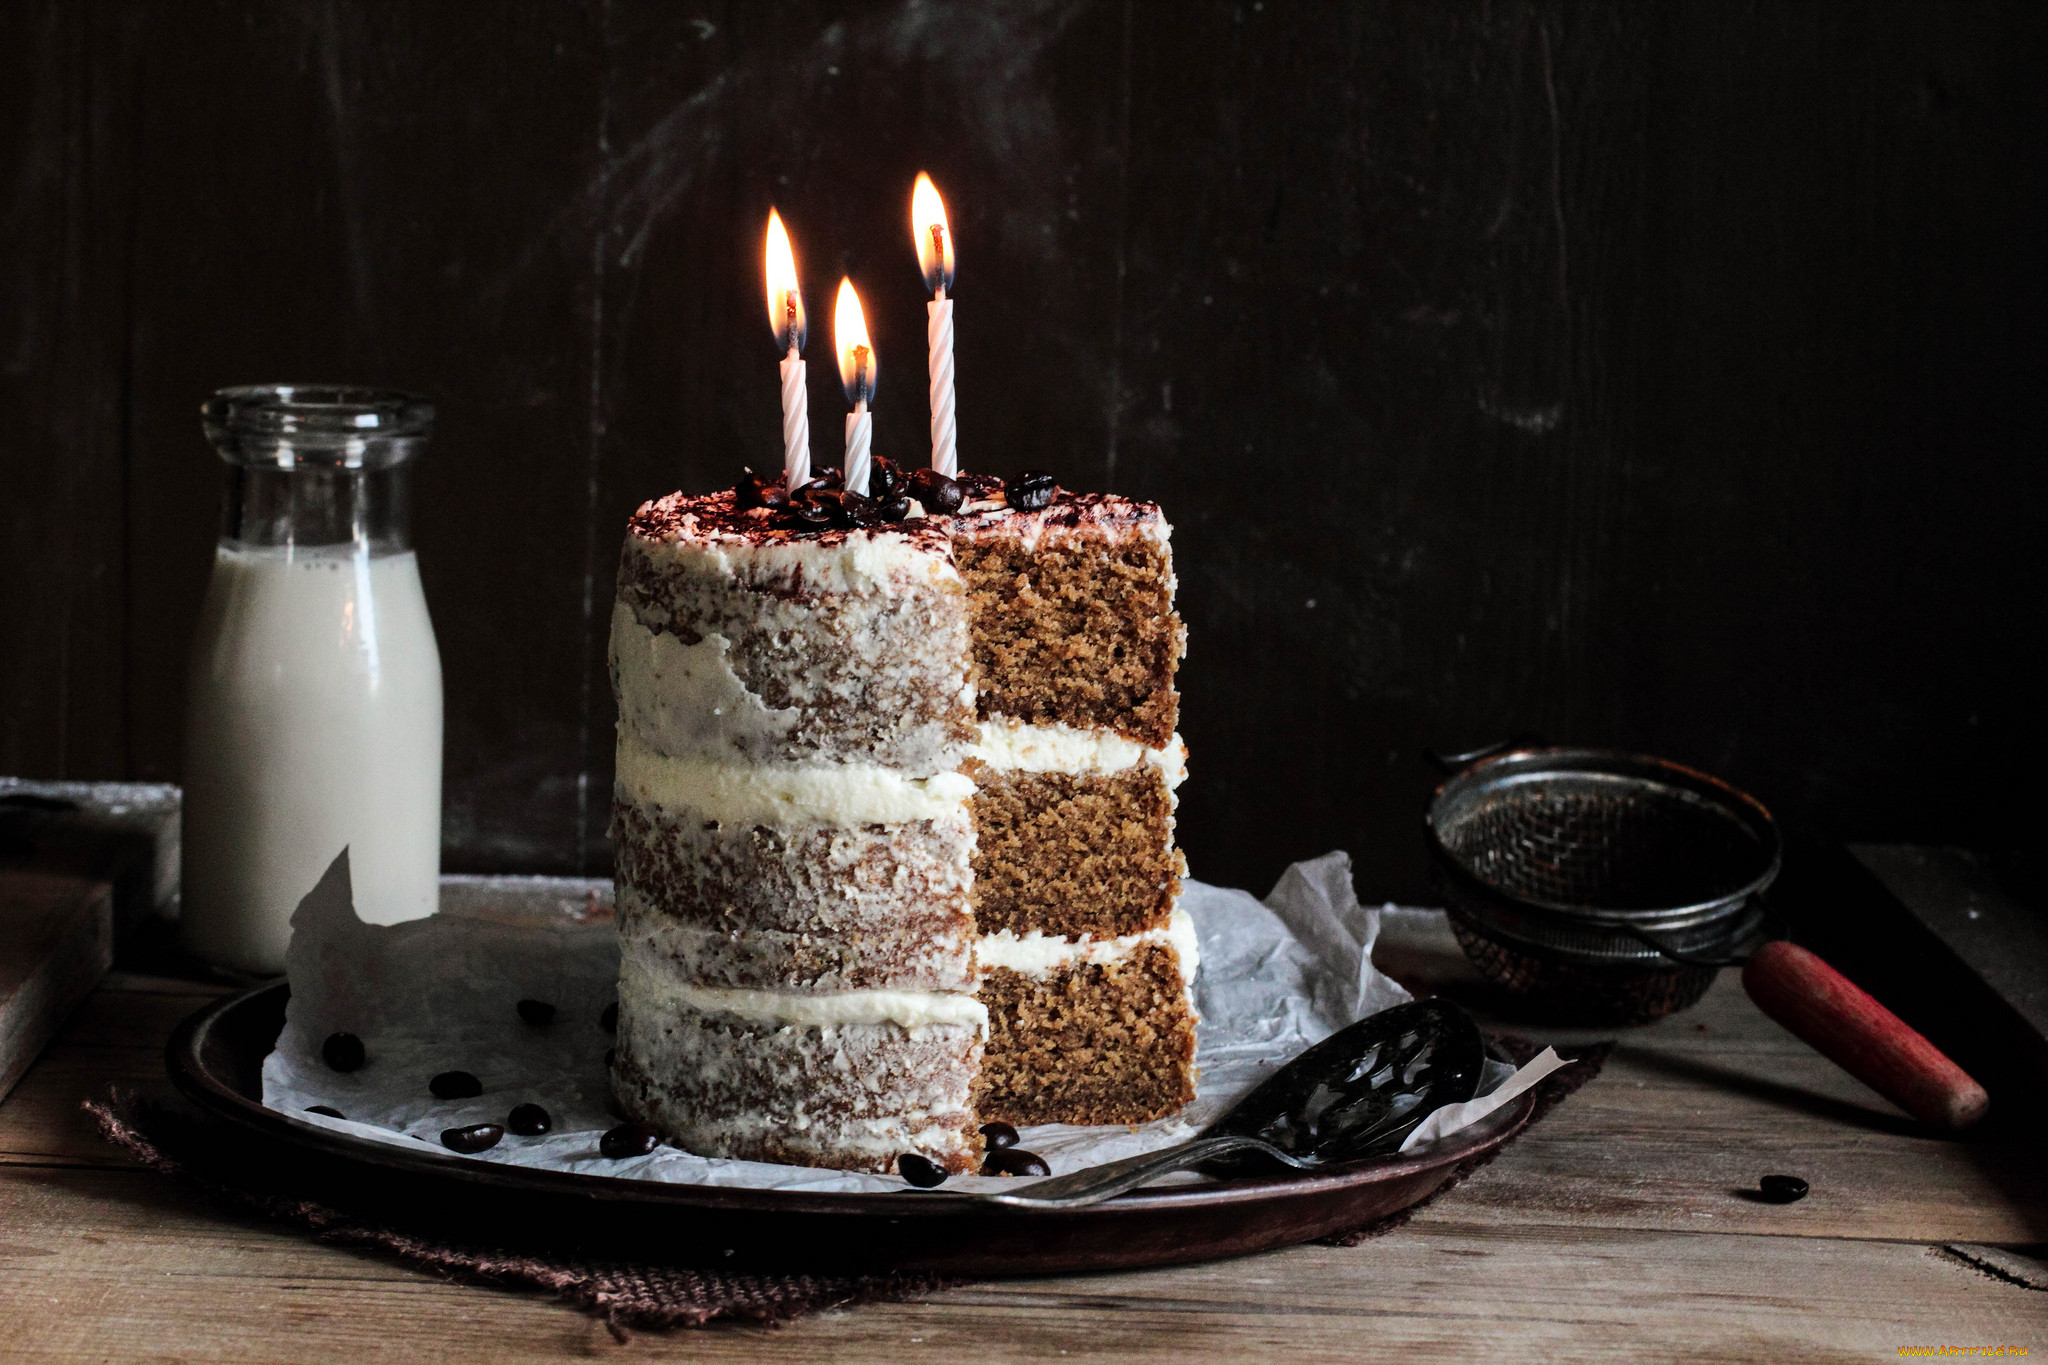 желтую торт и три свечки фото них можно